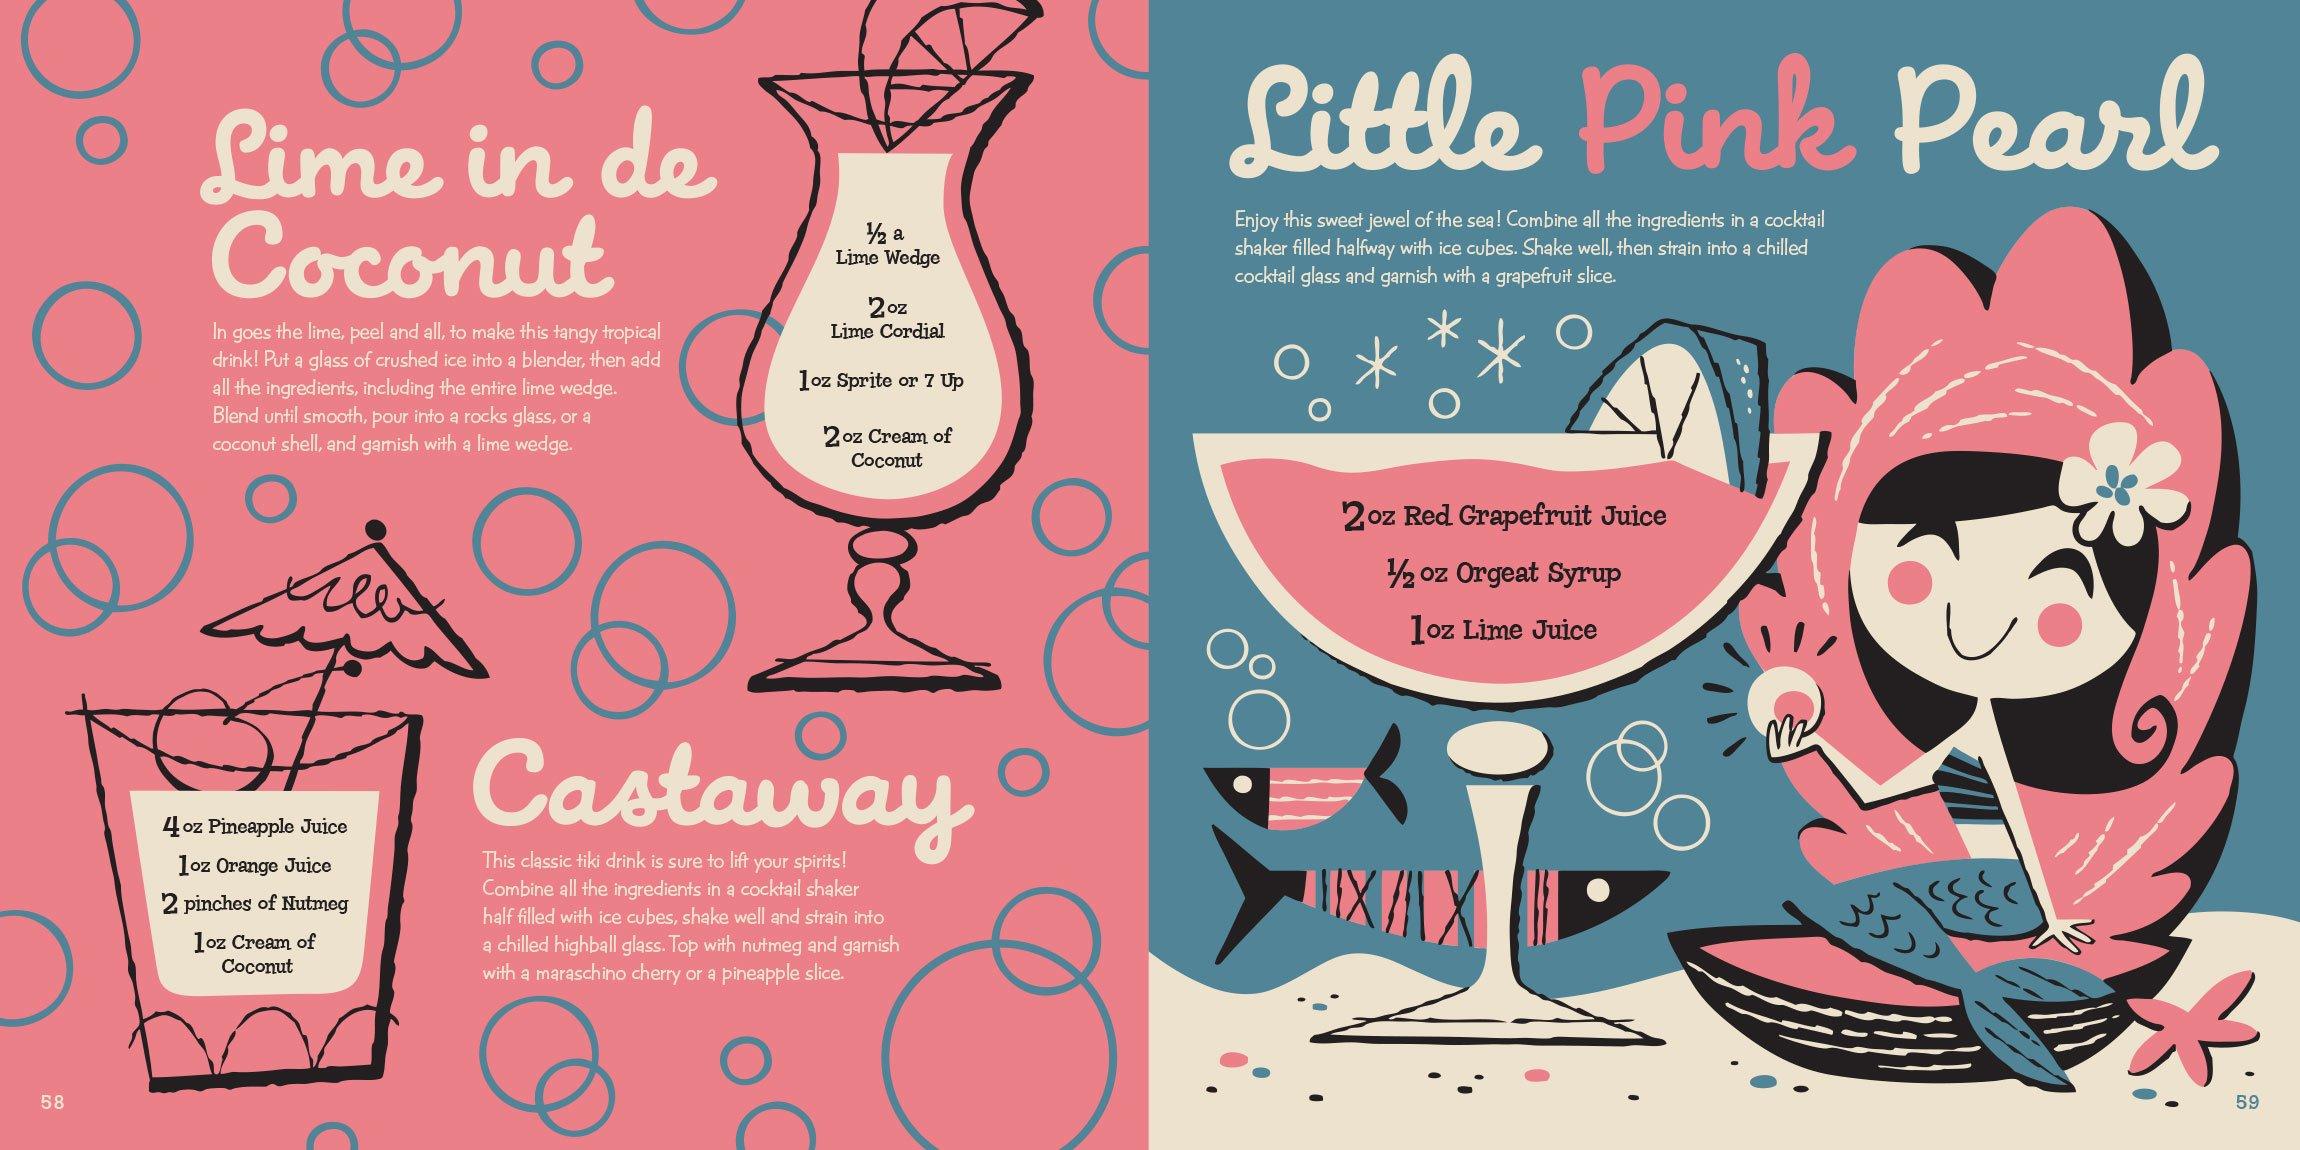 Kiddie Cocktails: Amazon.es: Stuart Sandler, Derek Yaniger, Charles Phoenix: Libros en idiomas extranjeros